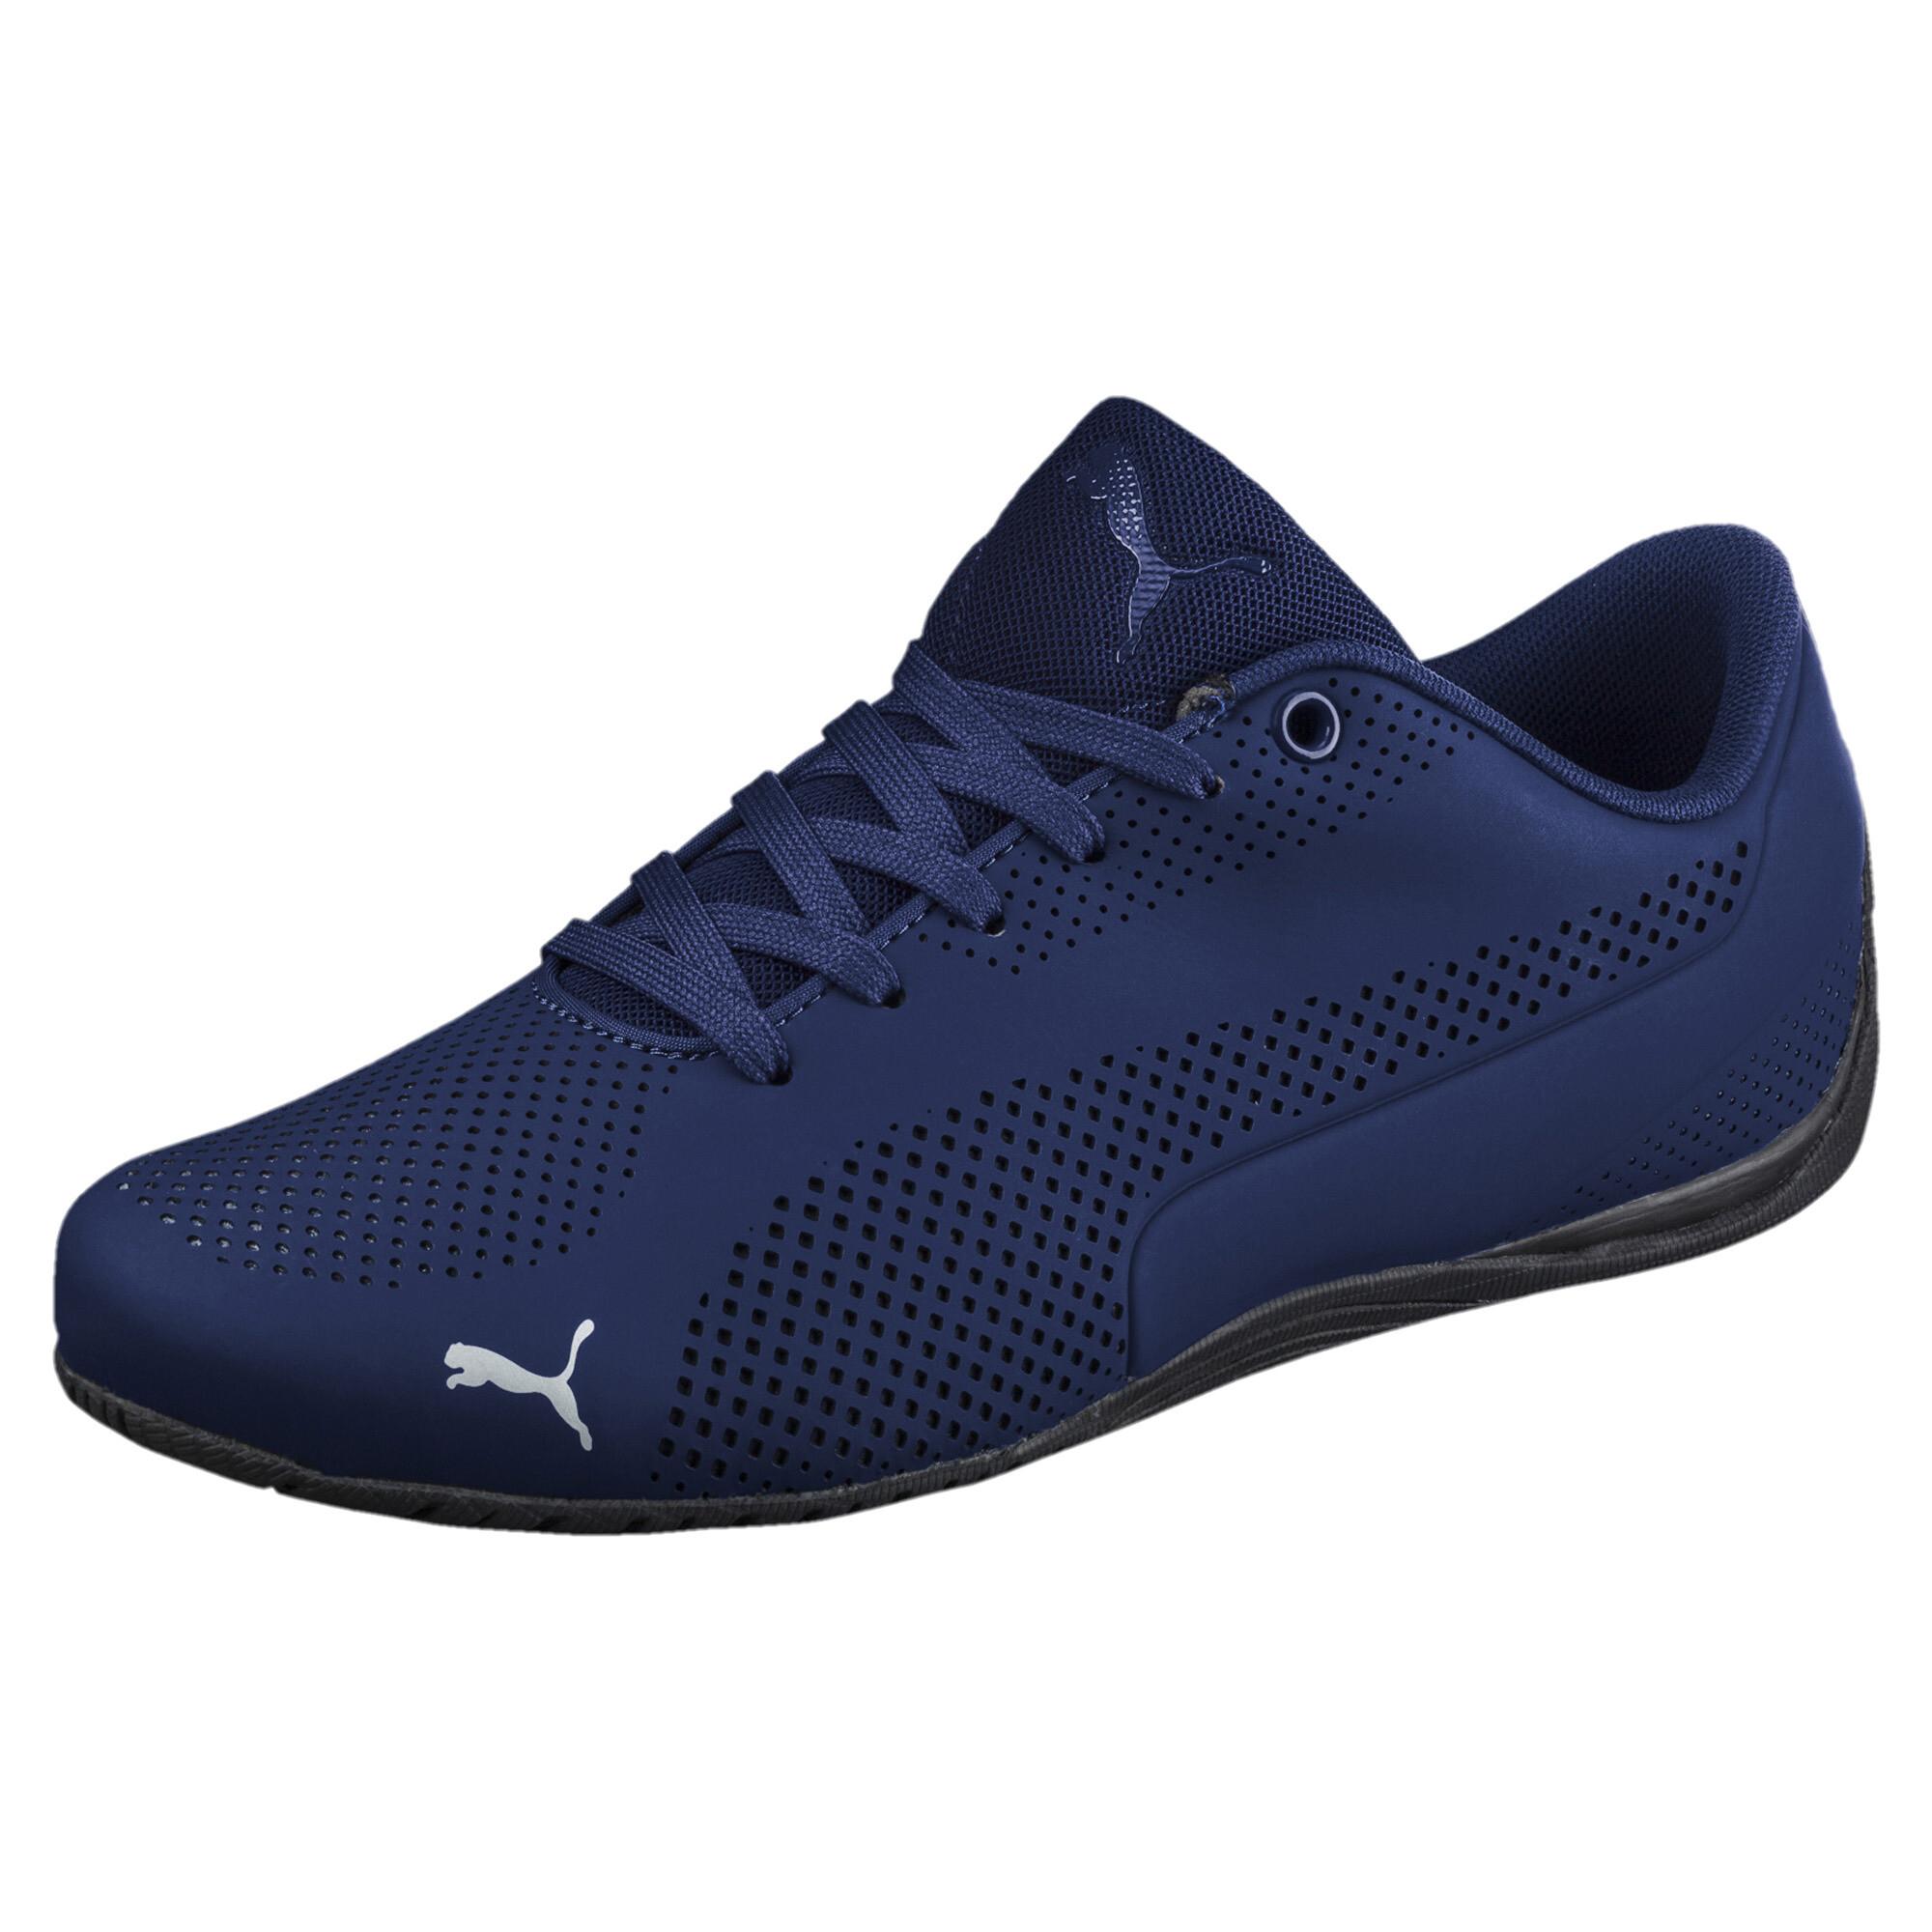 PUMA-Men-039-s-Drift-Cat-Ultra-Reflective-Shoes thumbnail 9